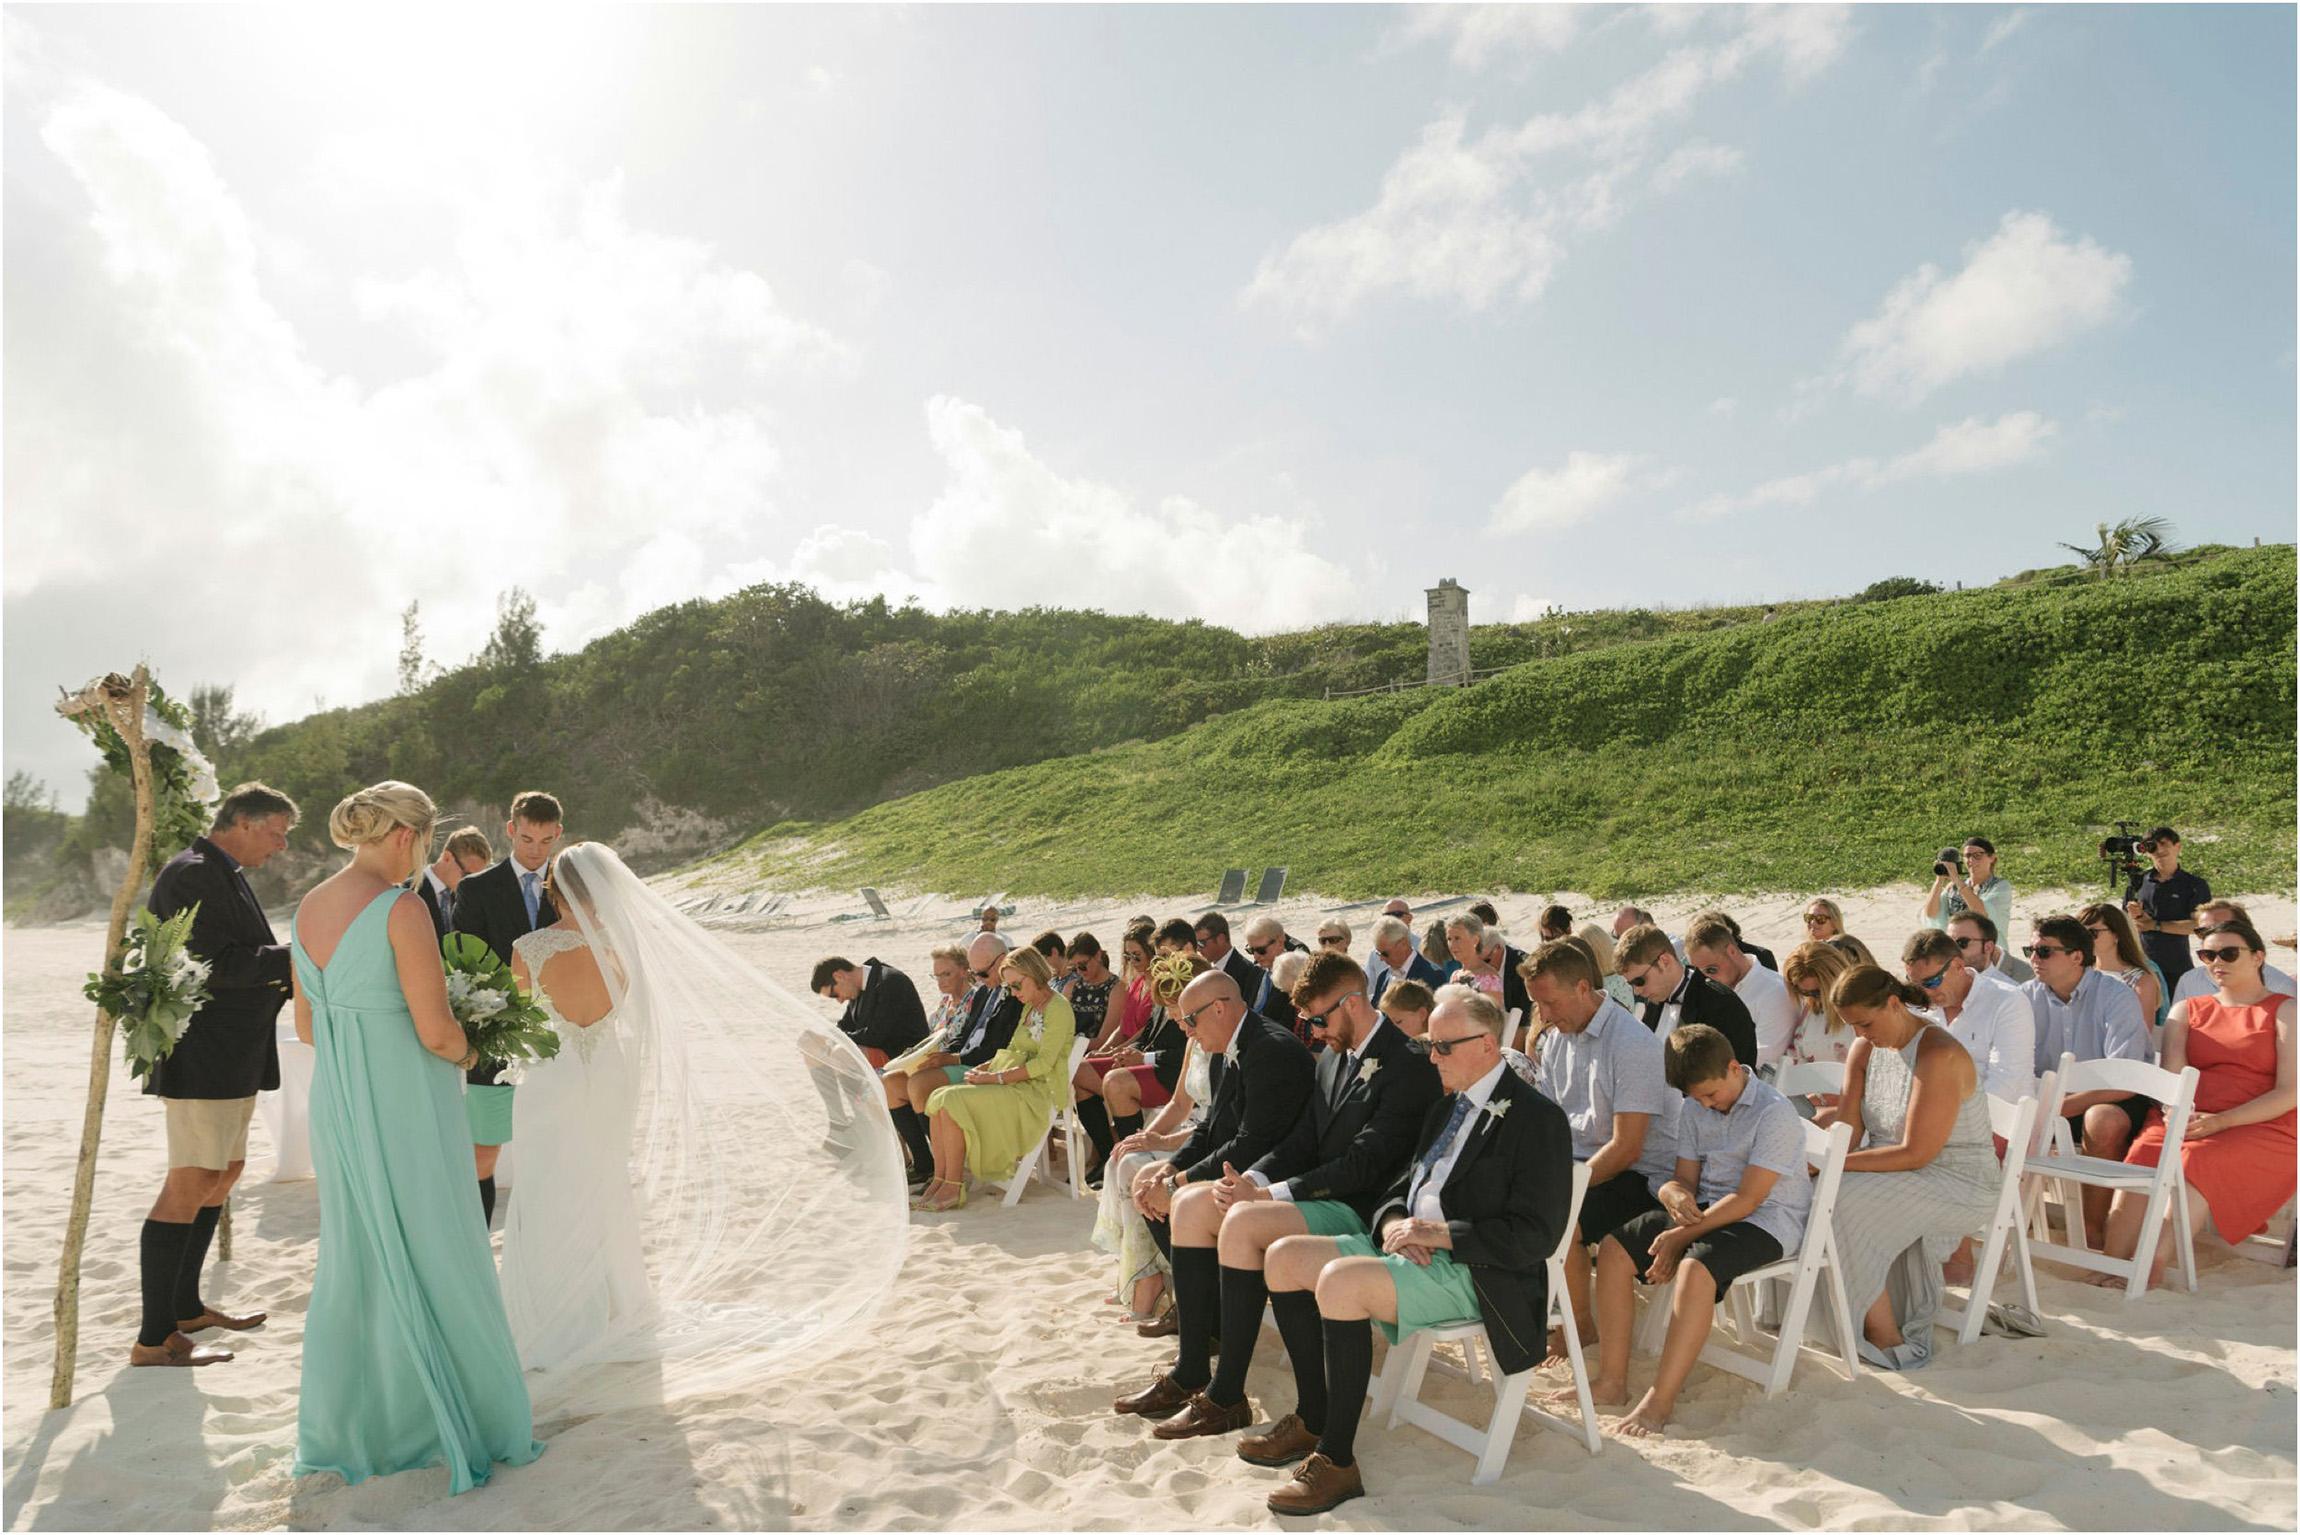 ©FianderFoto_Bermuda Wedding Photographer_Mid Ocean_Rachel_Angus_047.jpg